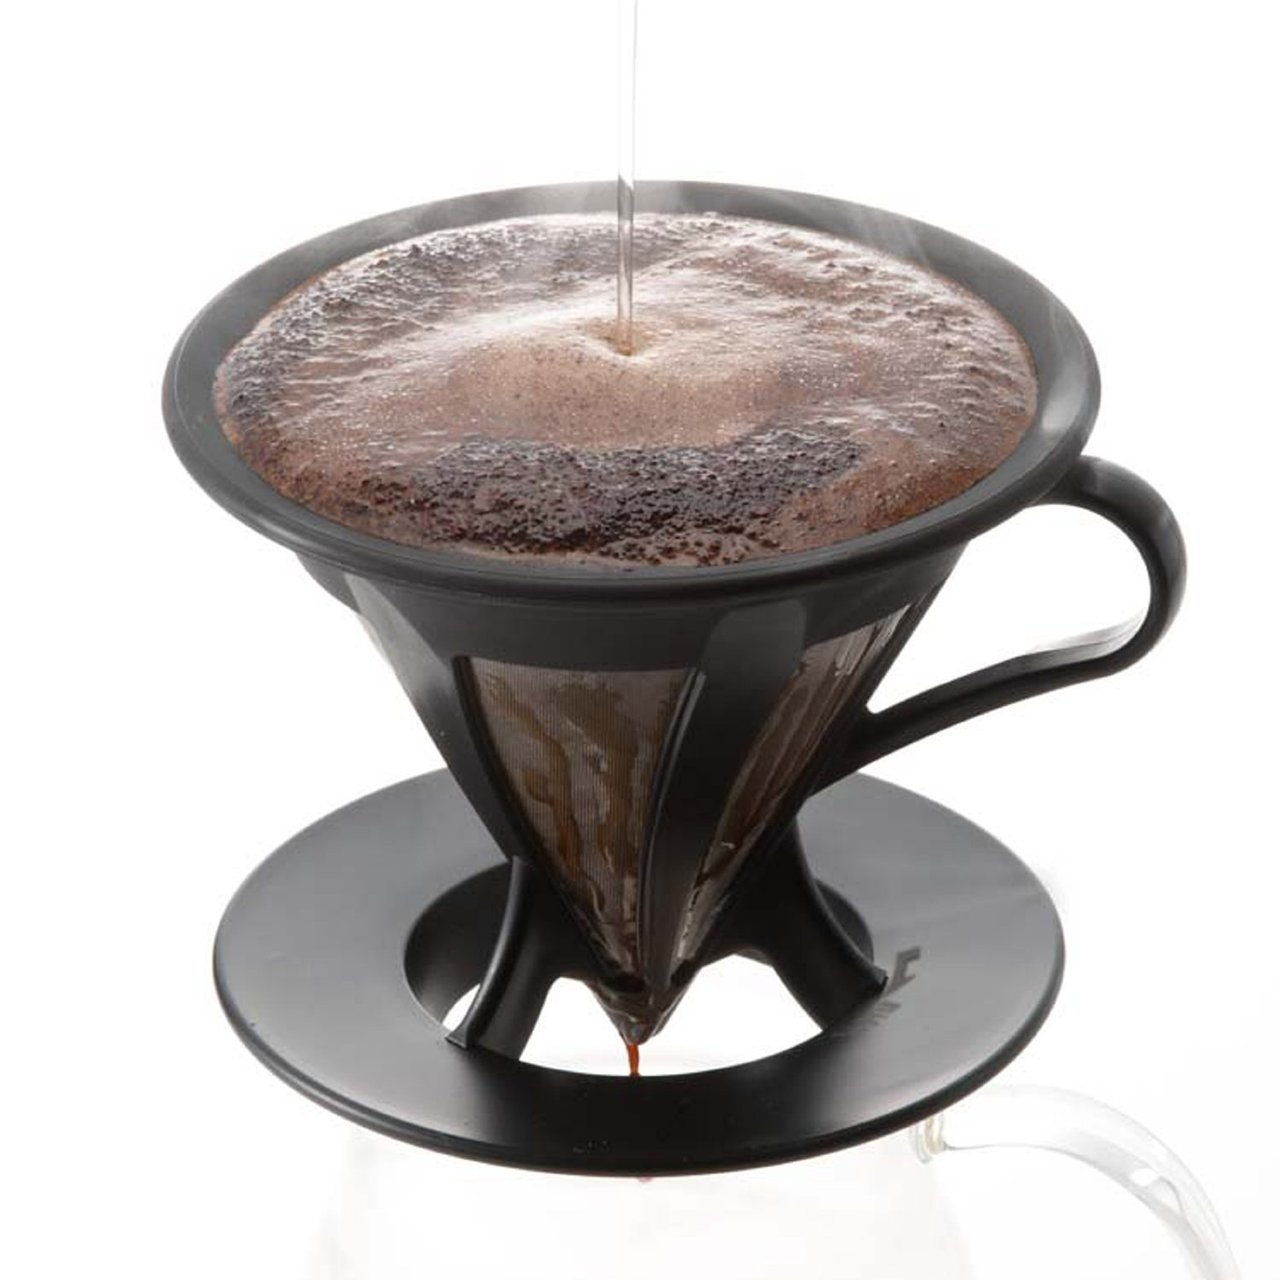 Hario Cafeor 02 Siyah Demleme Filtresi